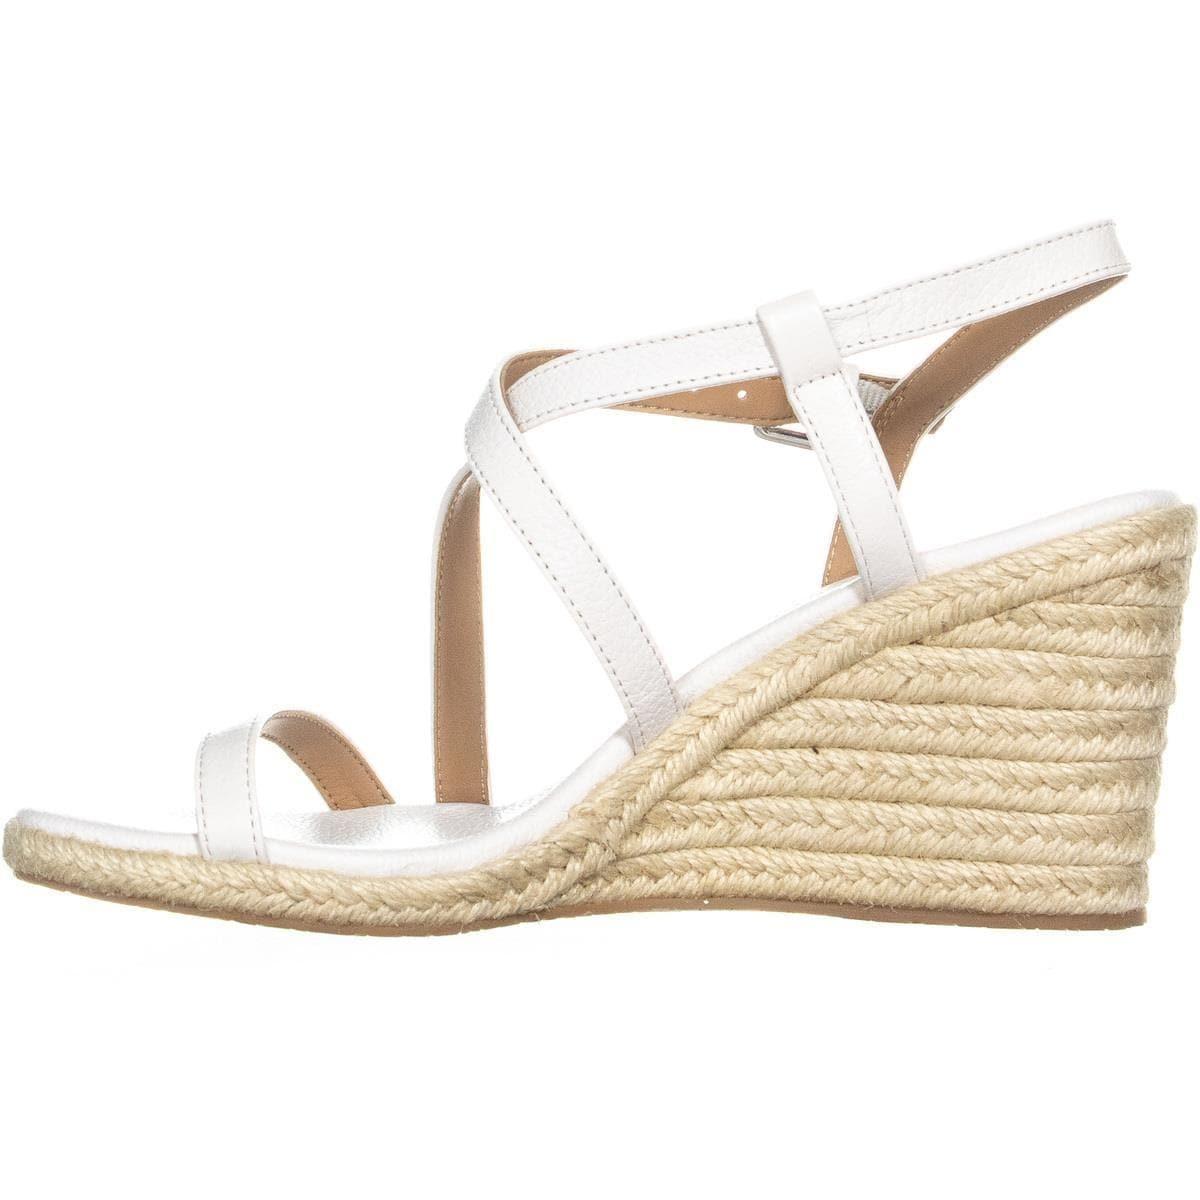 6d01737d44b6e Shop Calvin Klein Bellemine Espadrille Wedge Sandals